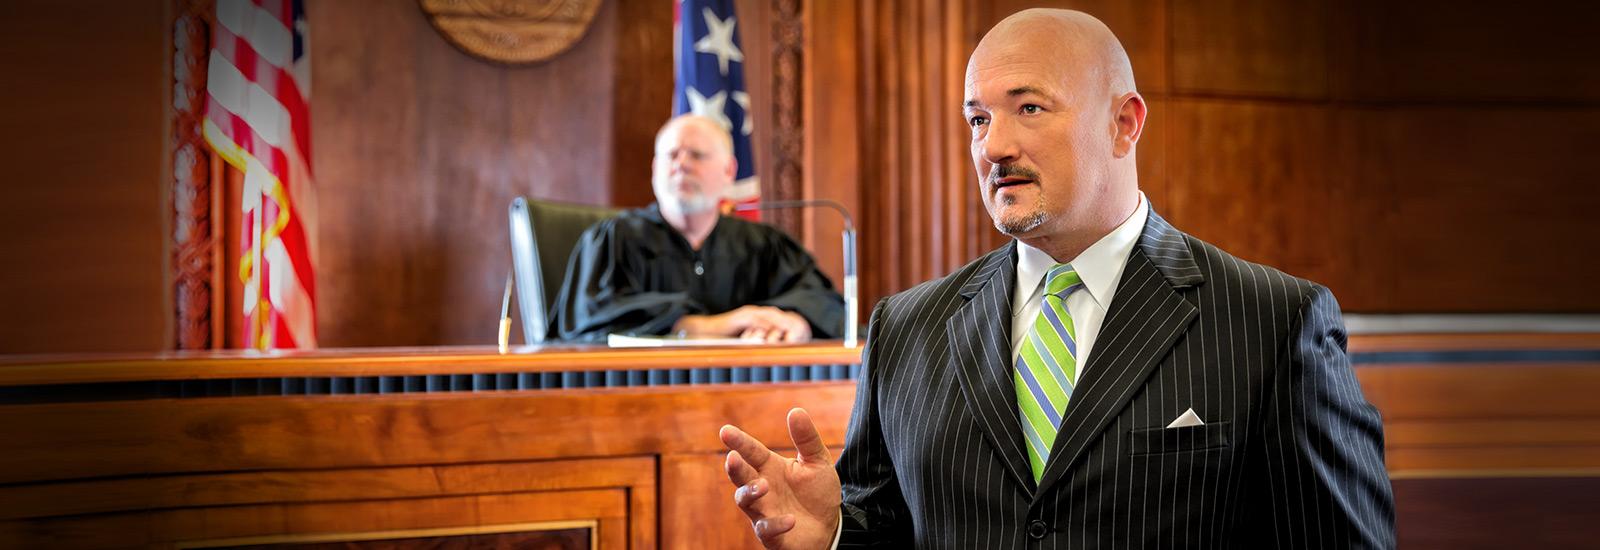 Knoxville DUI Lawyer Jeffrey Whitt